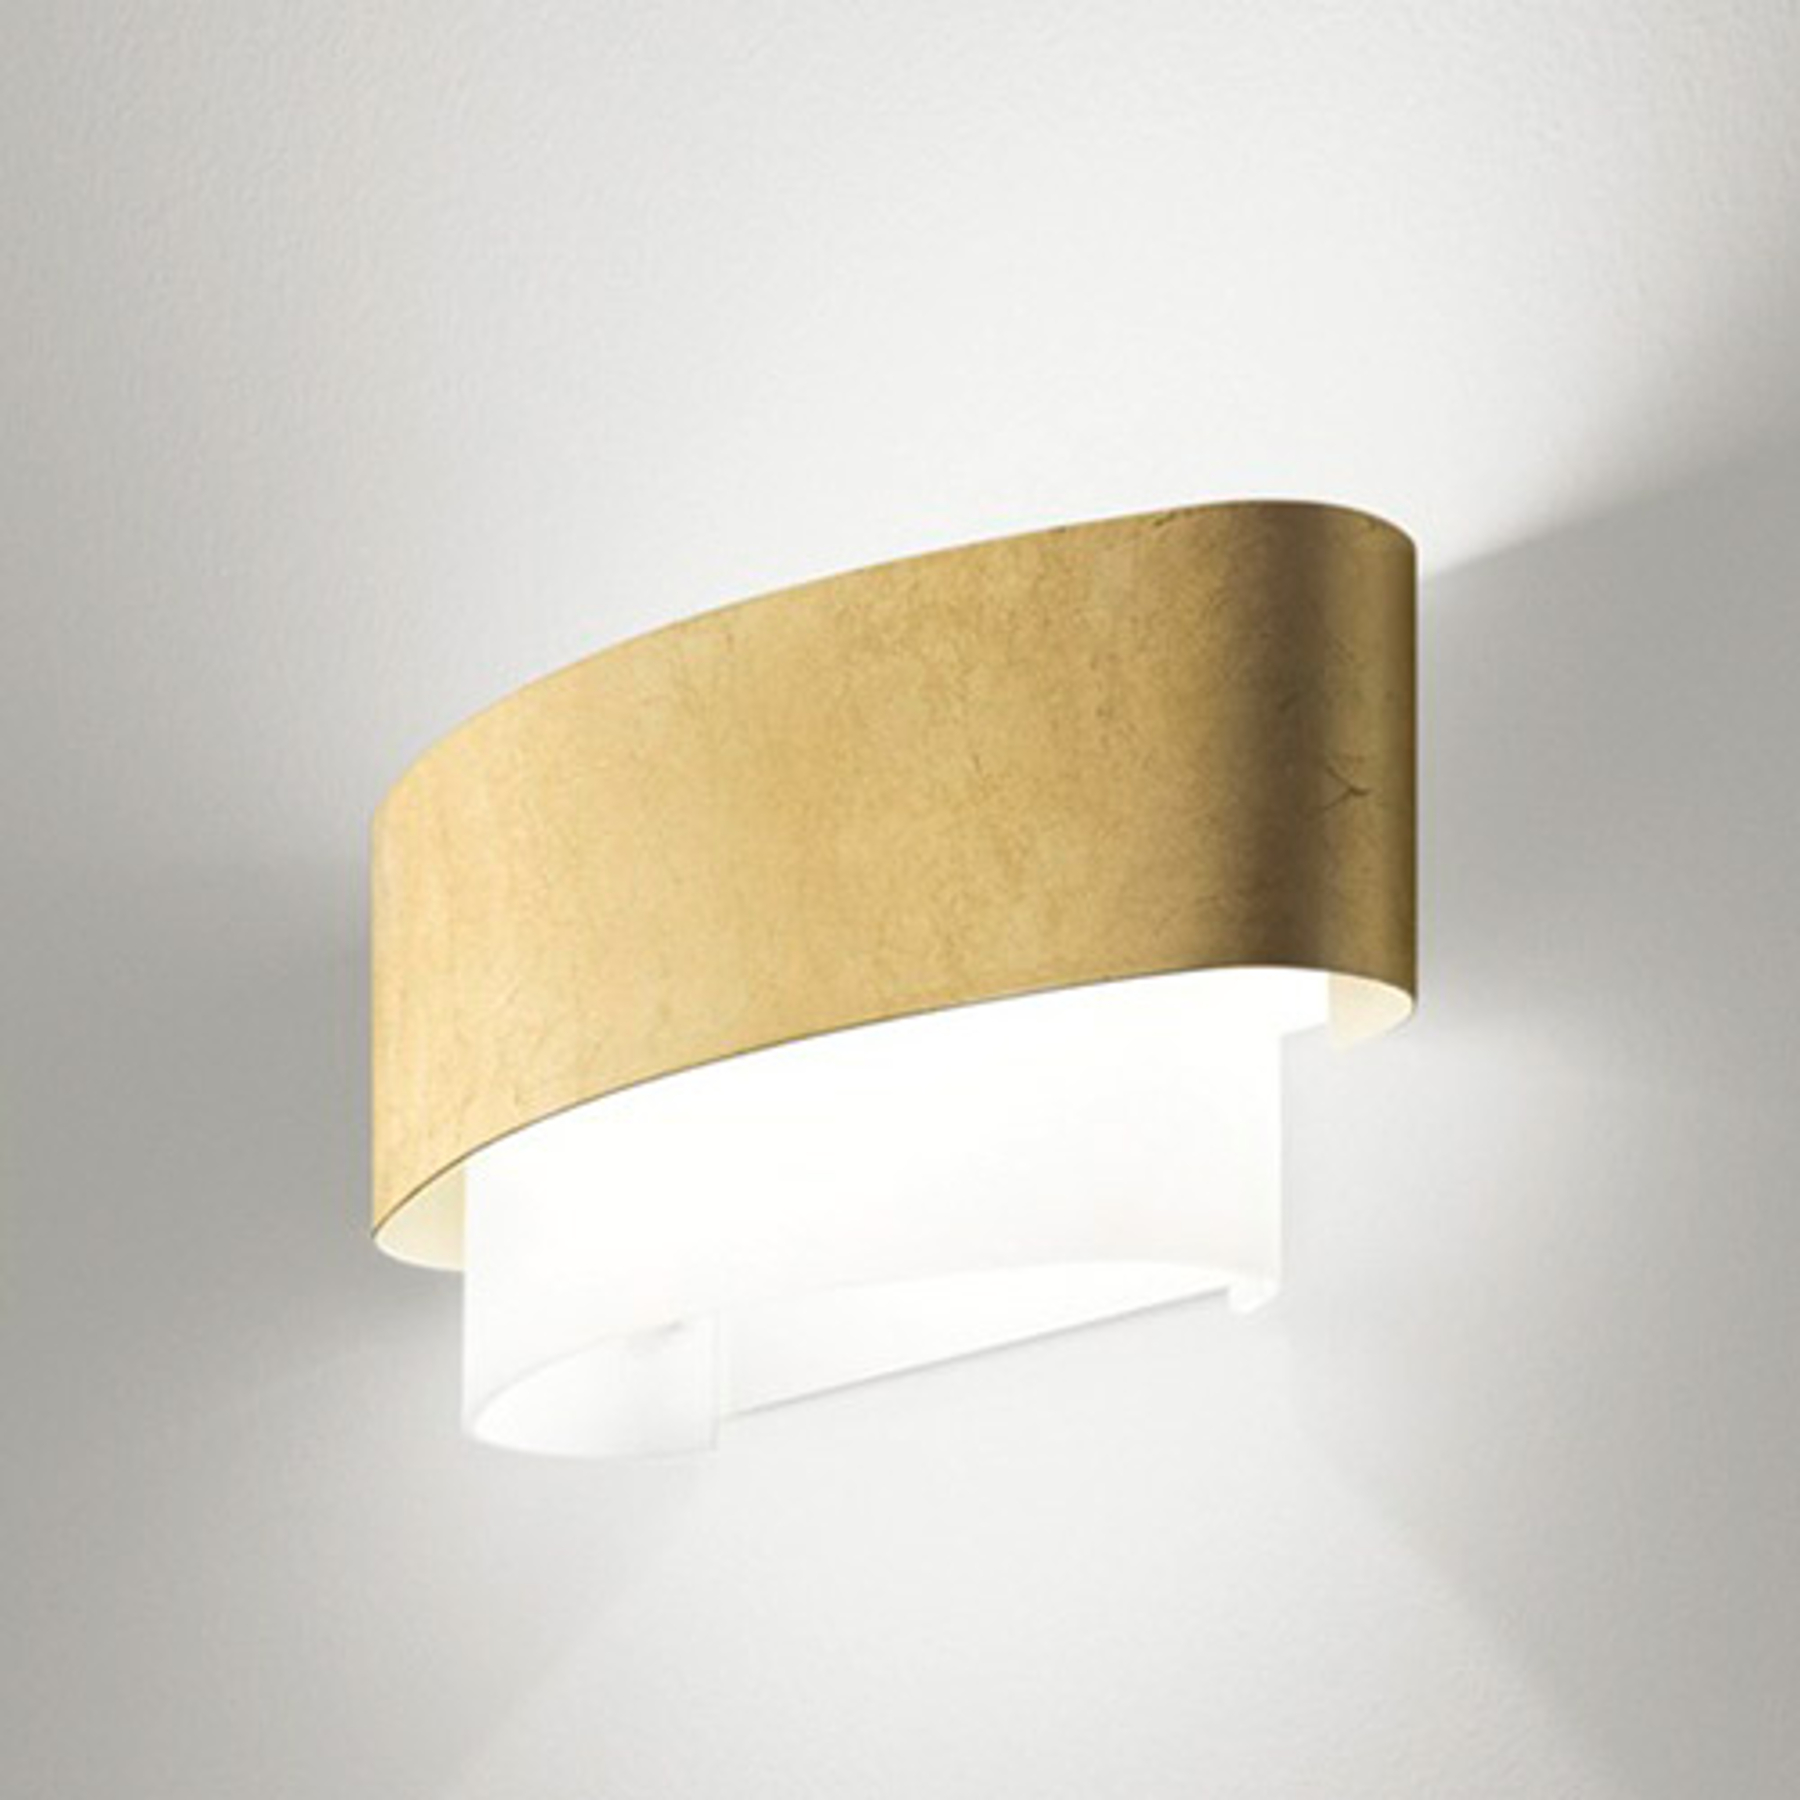 In bladgoud-optiek - wandlamp Matrioska